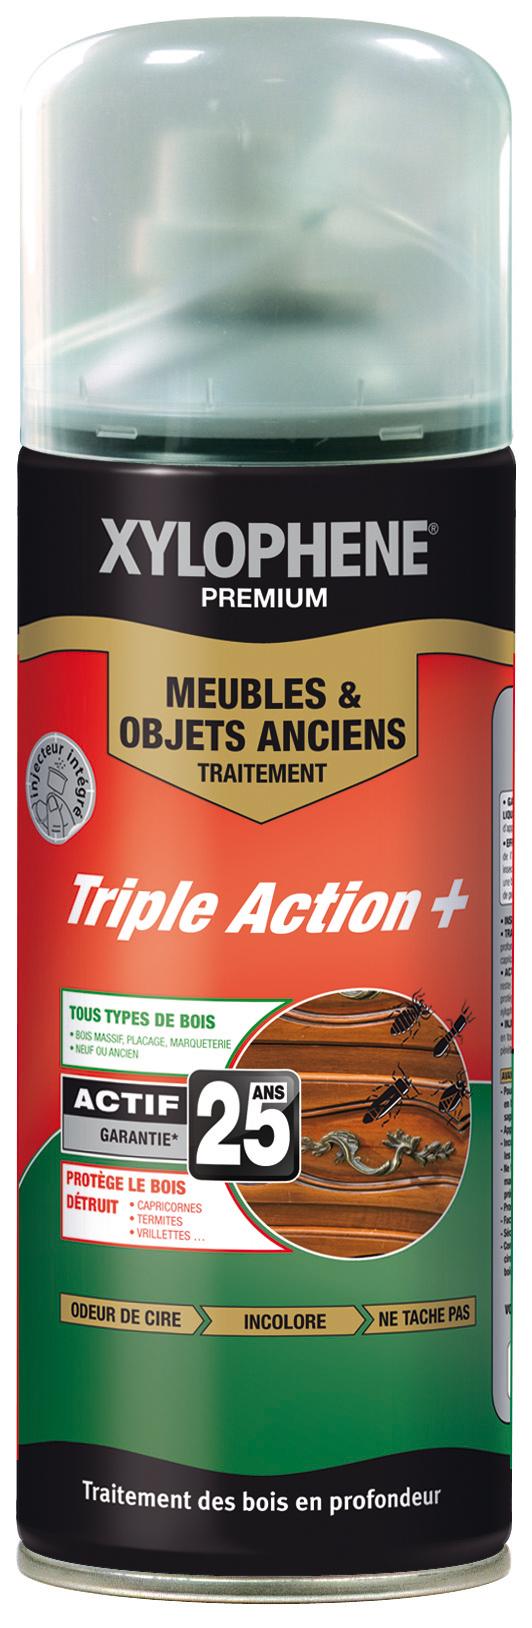 XYLOPHENE Traitement Meubles U0026 Objets Anciens (c)XYLOPHENE